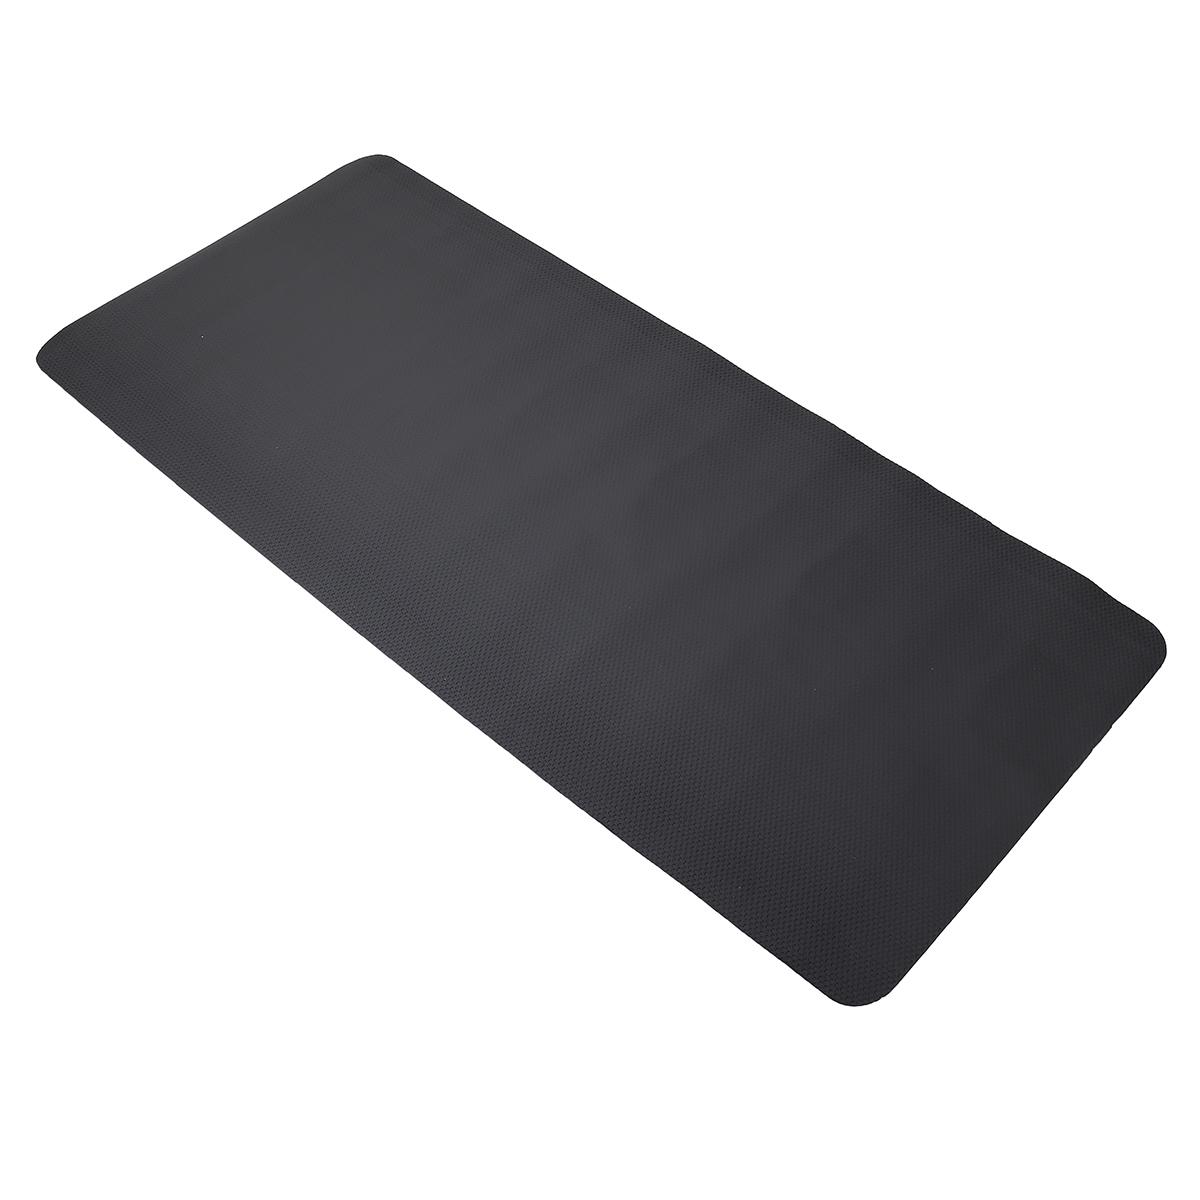 180x75cm Exercise Mat Yoga Mats Gym Equipment Pad For